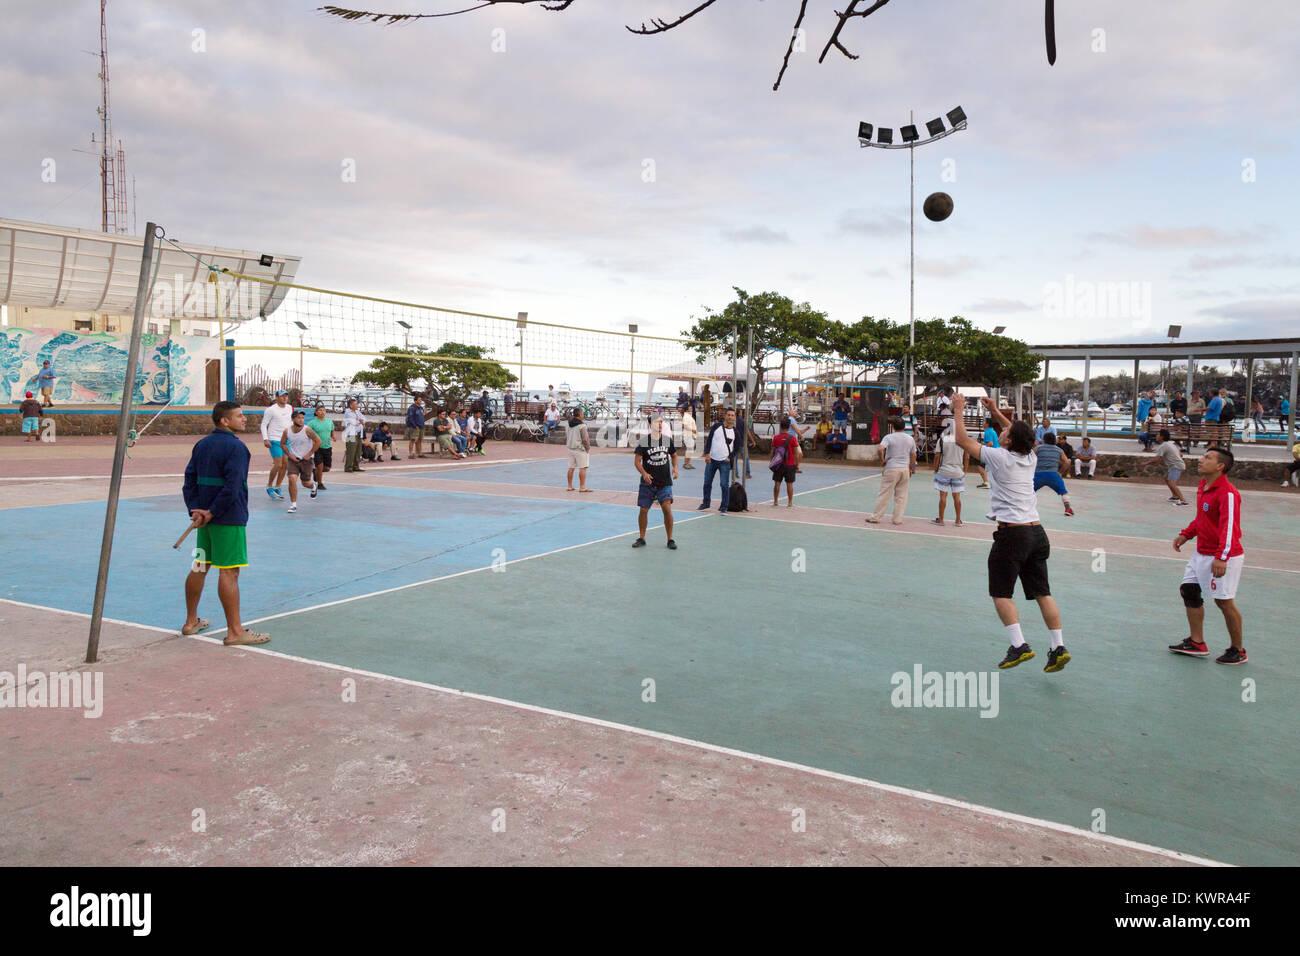 Local Galapagos people playing volleyball, Puerto Ayora, Santa cruz island, galapagos Islands, Ecuador South America - Stock Image